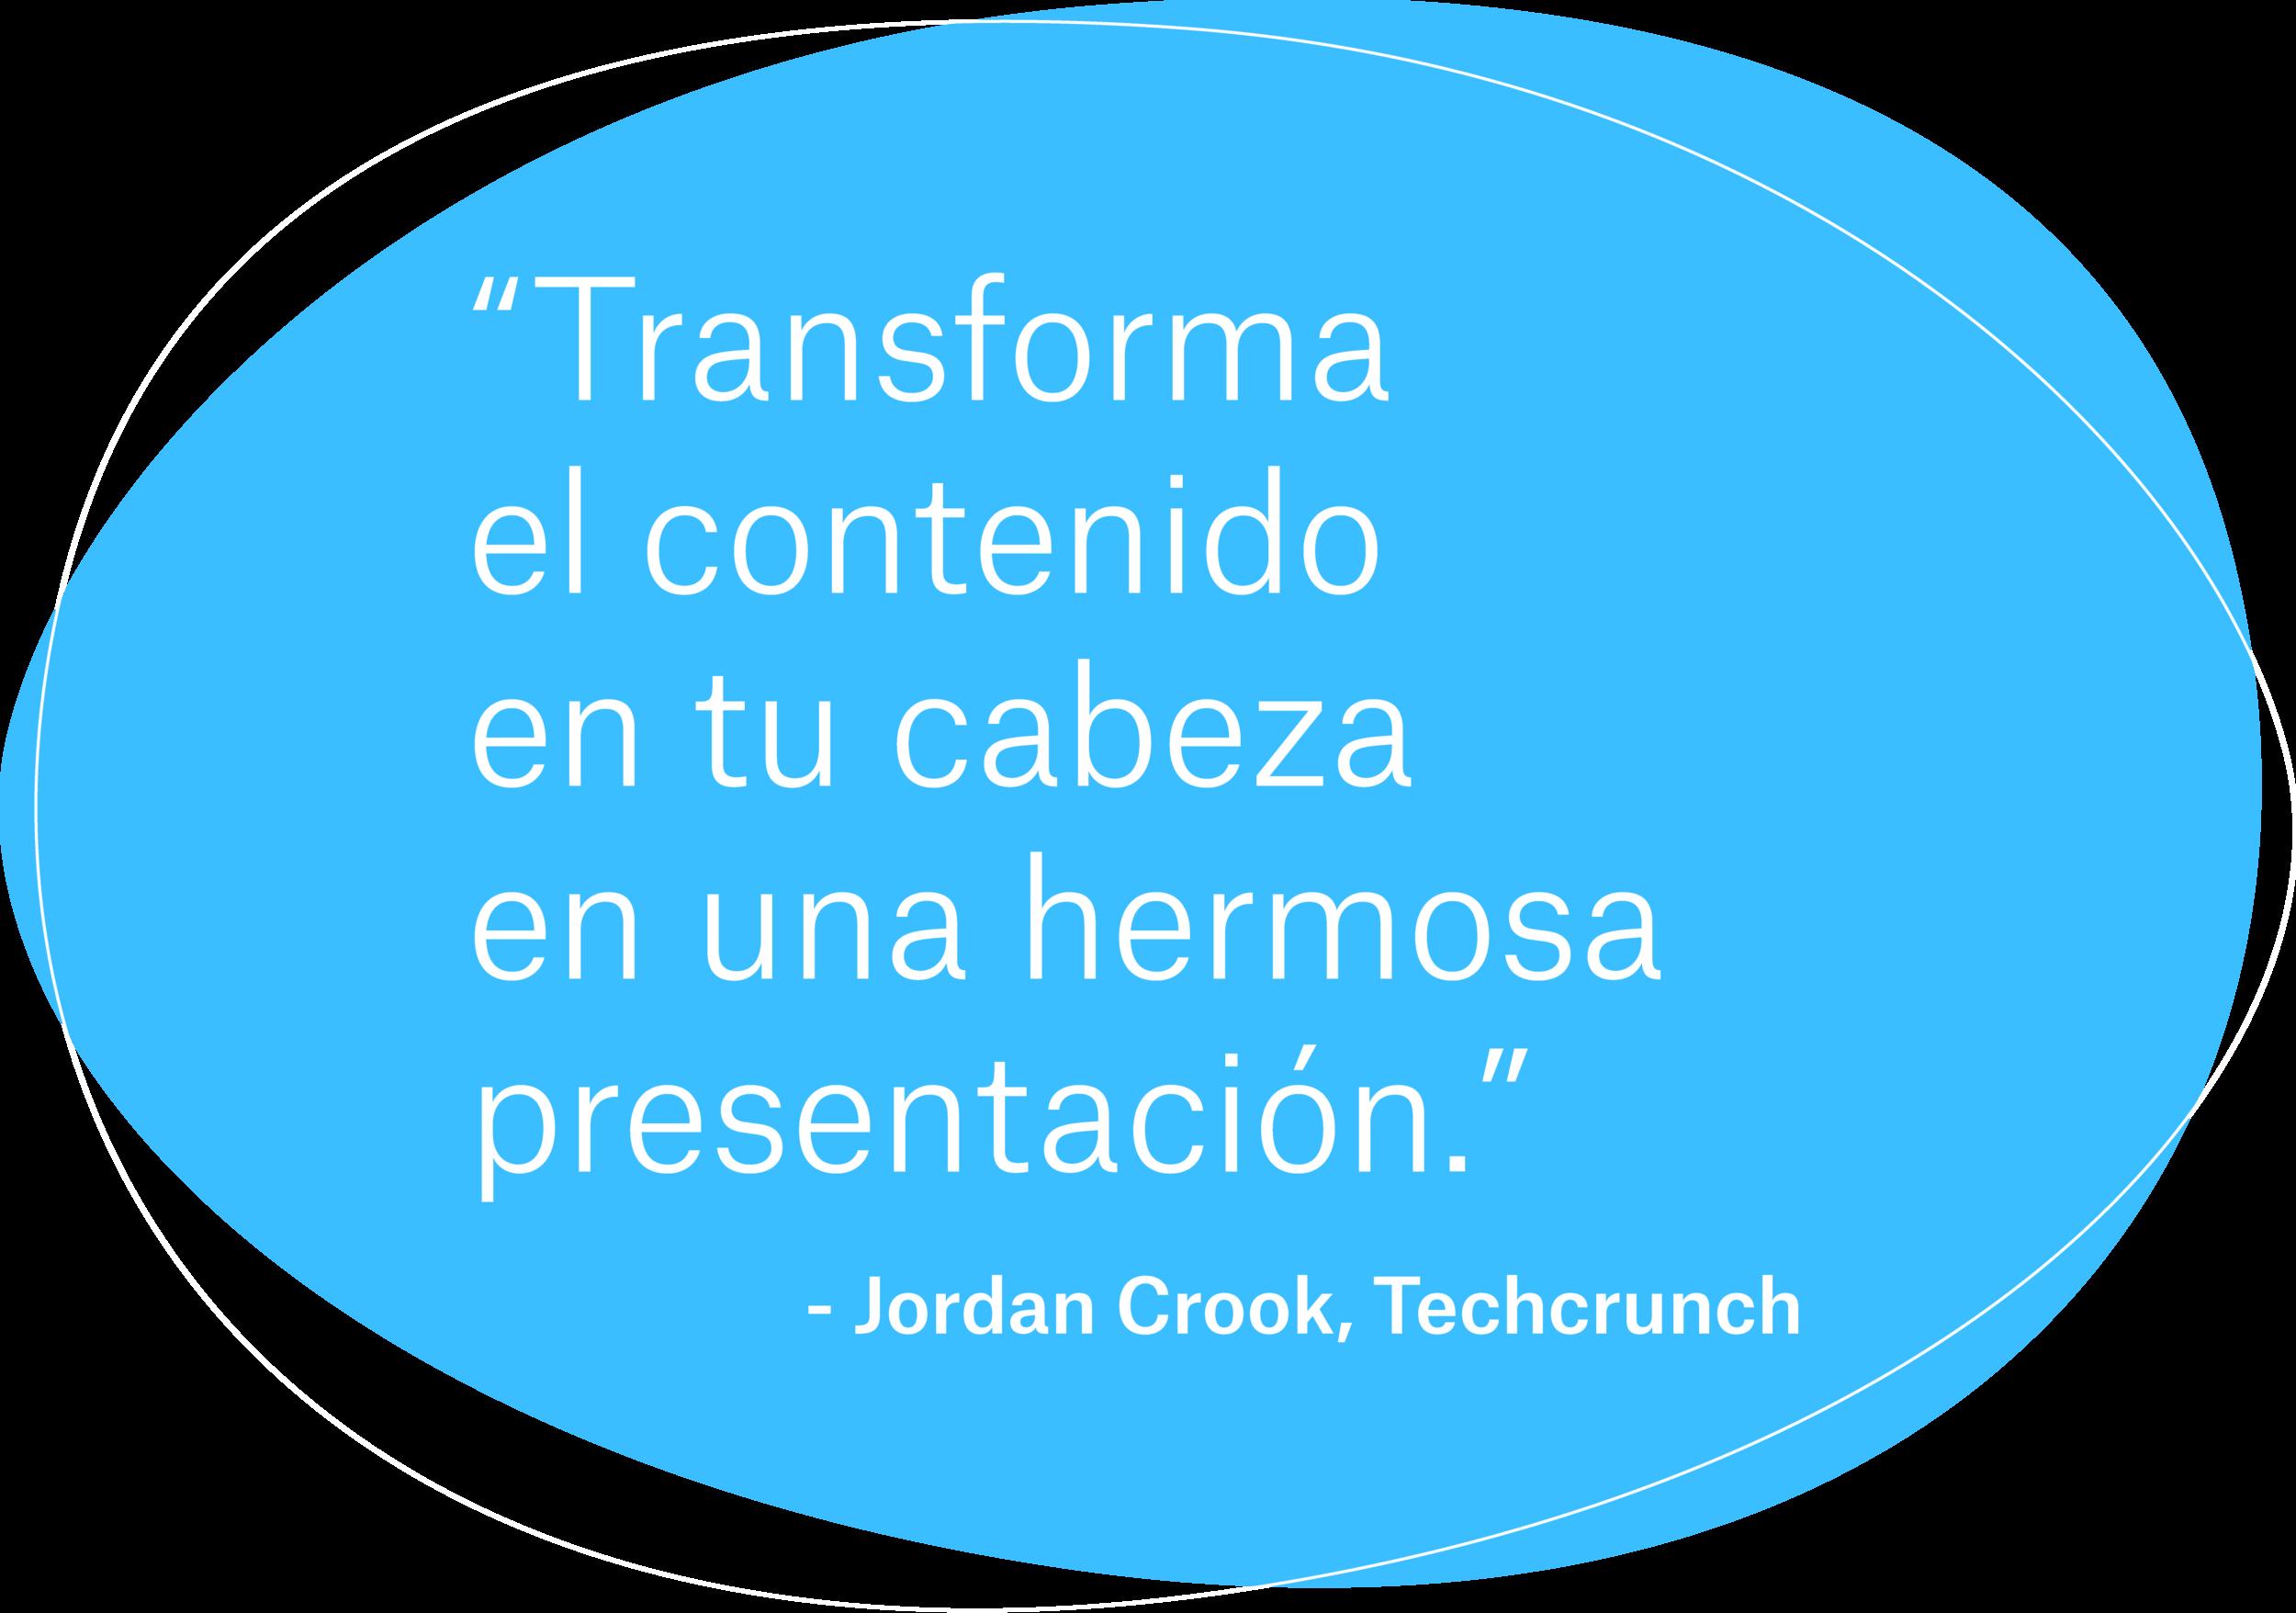 Jordan-crook-techcrunch.png